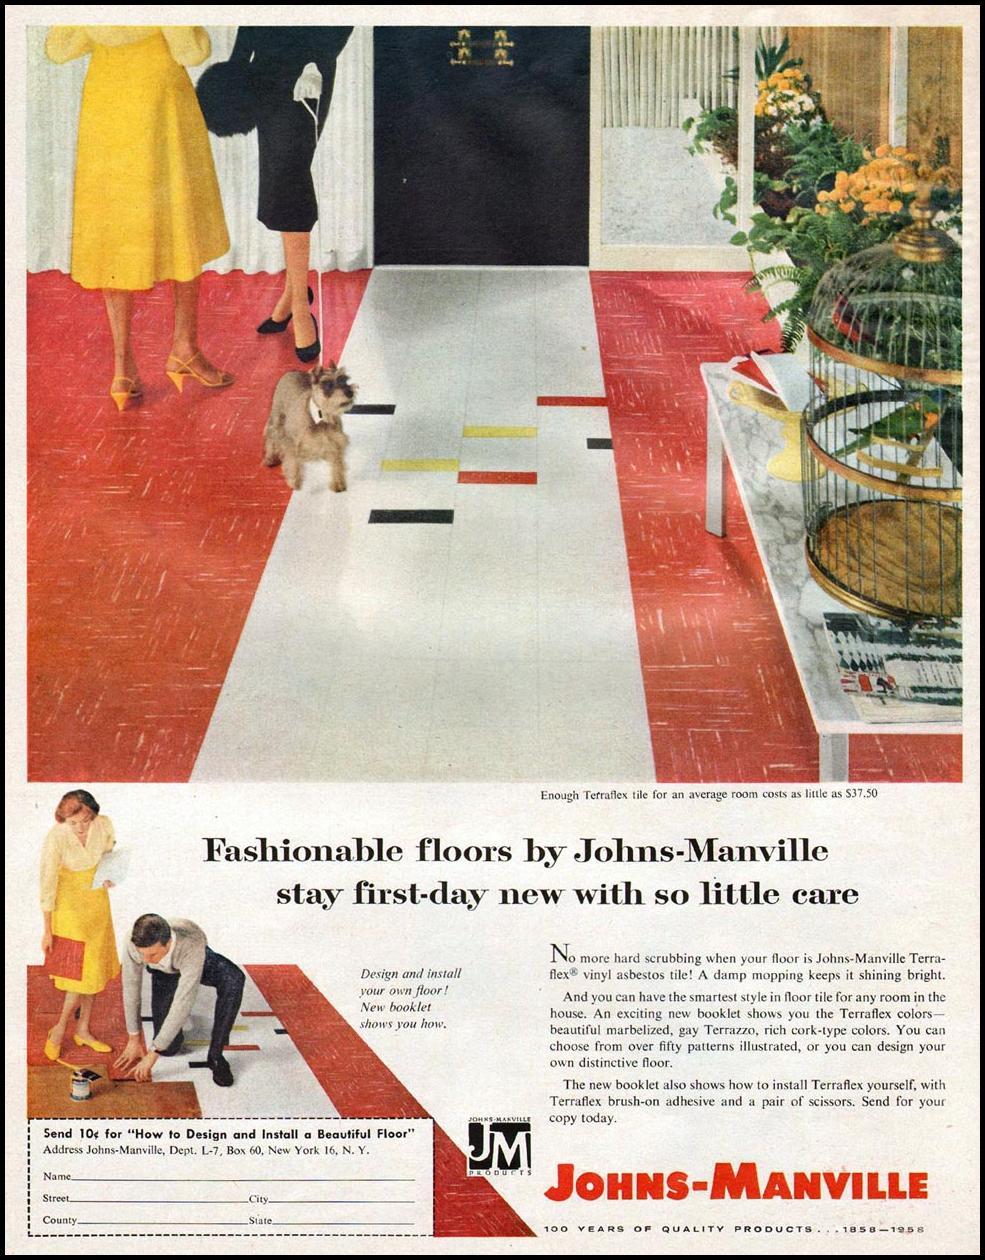 JOHNS-MANVILLE VINYL ASBESTOS TILE LIFE 11/24/1957